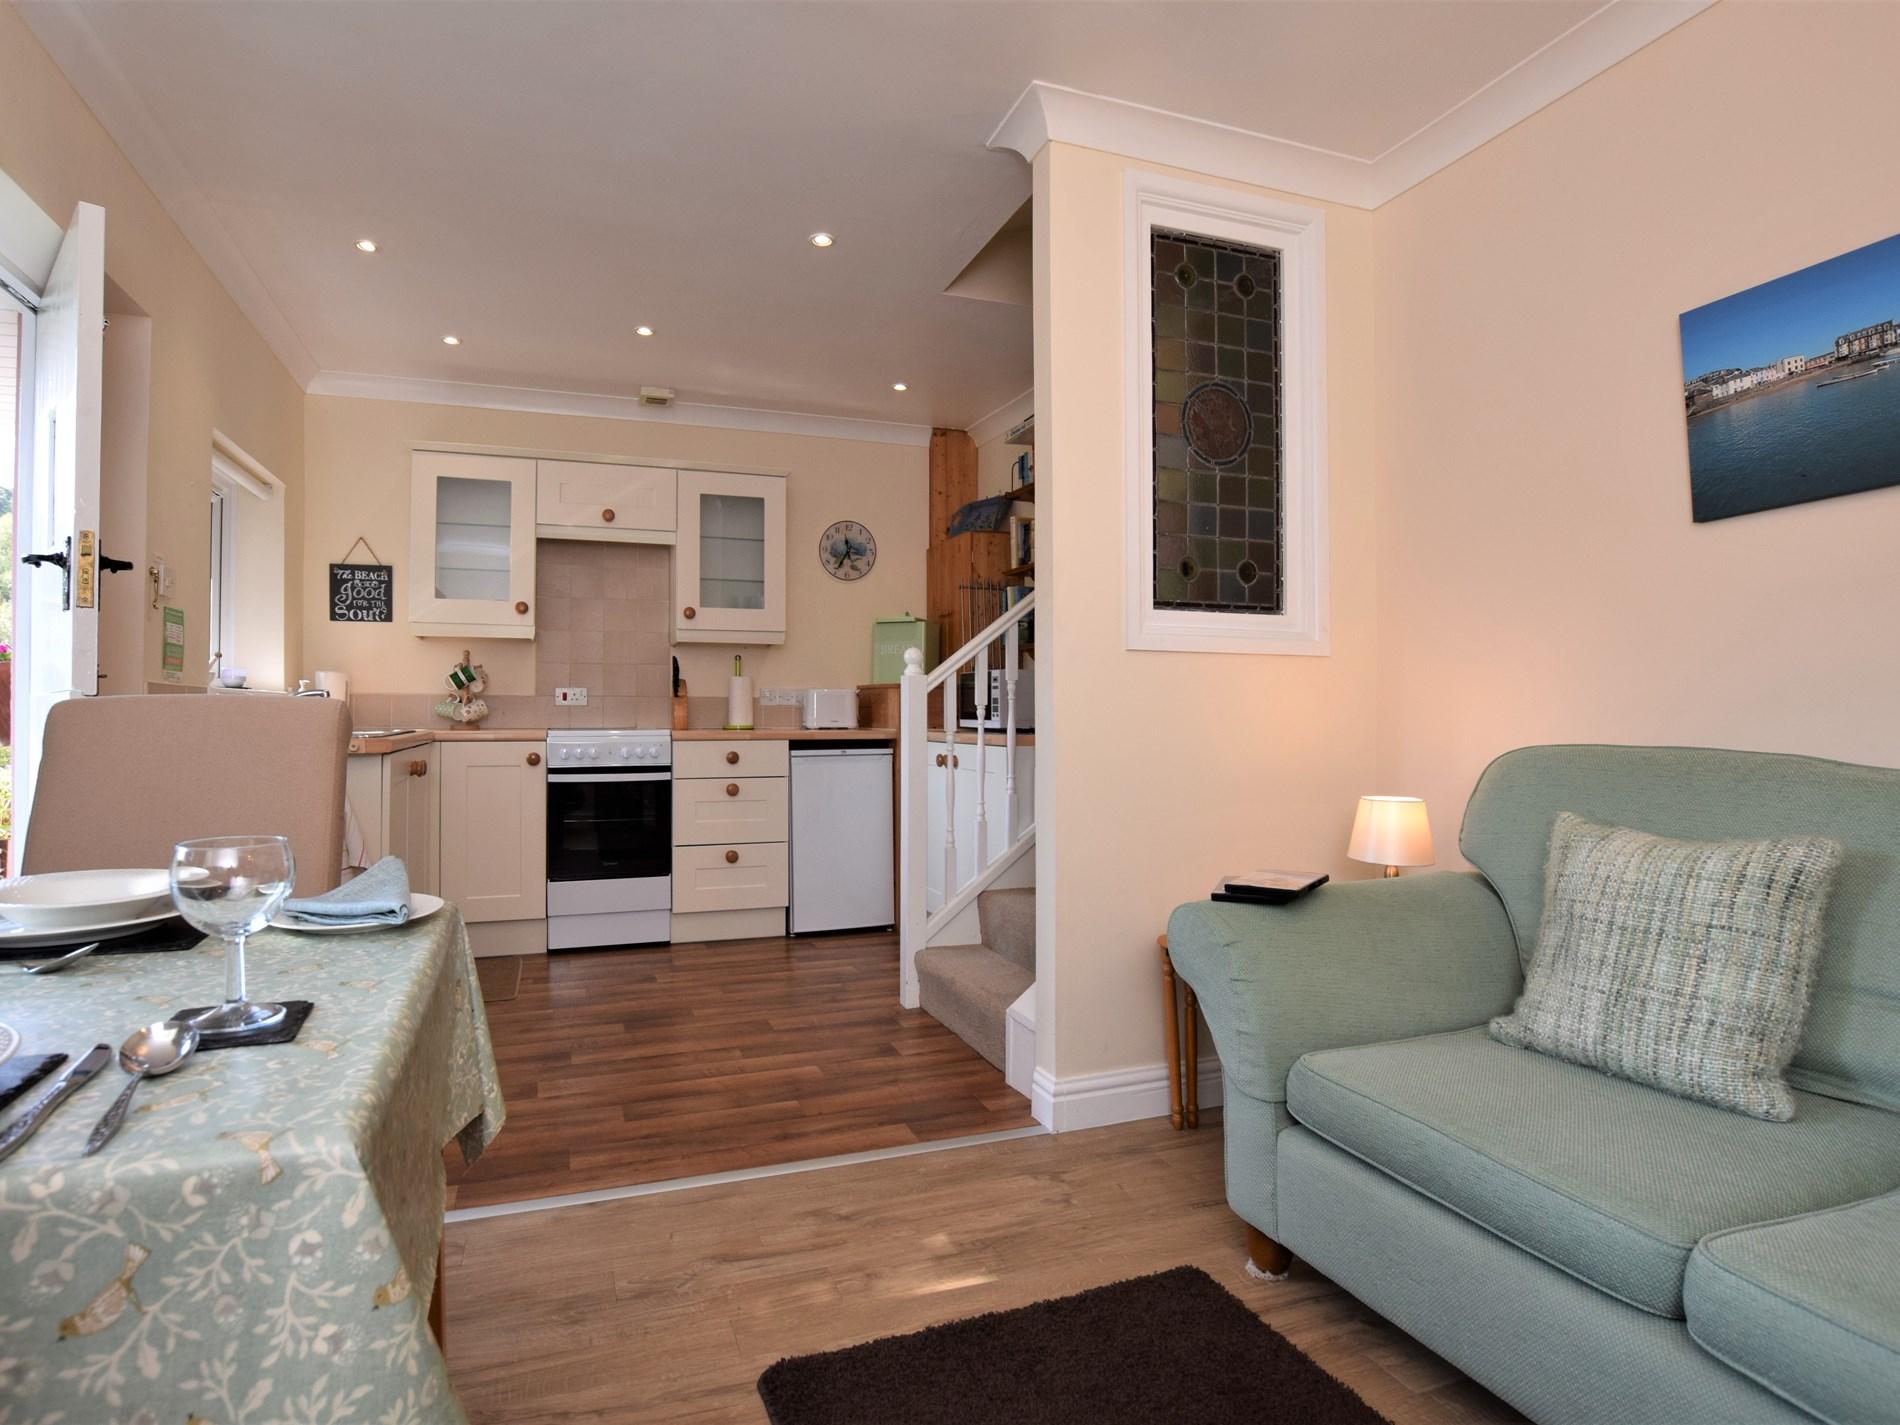 1 Bedroom House in North Devon, Devon